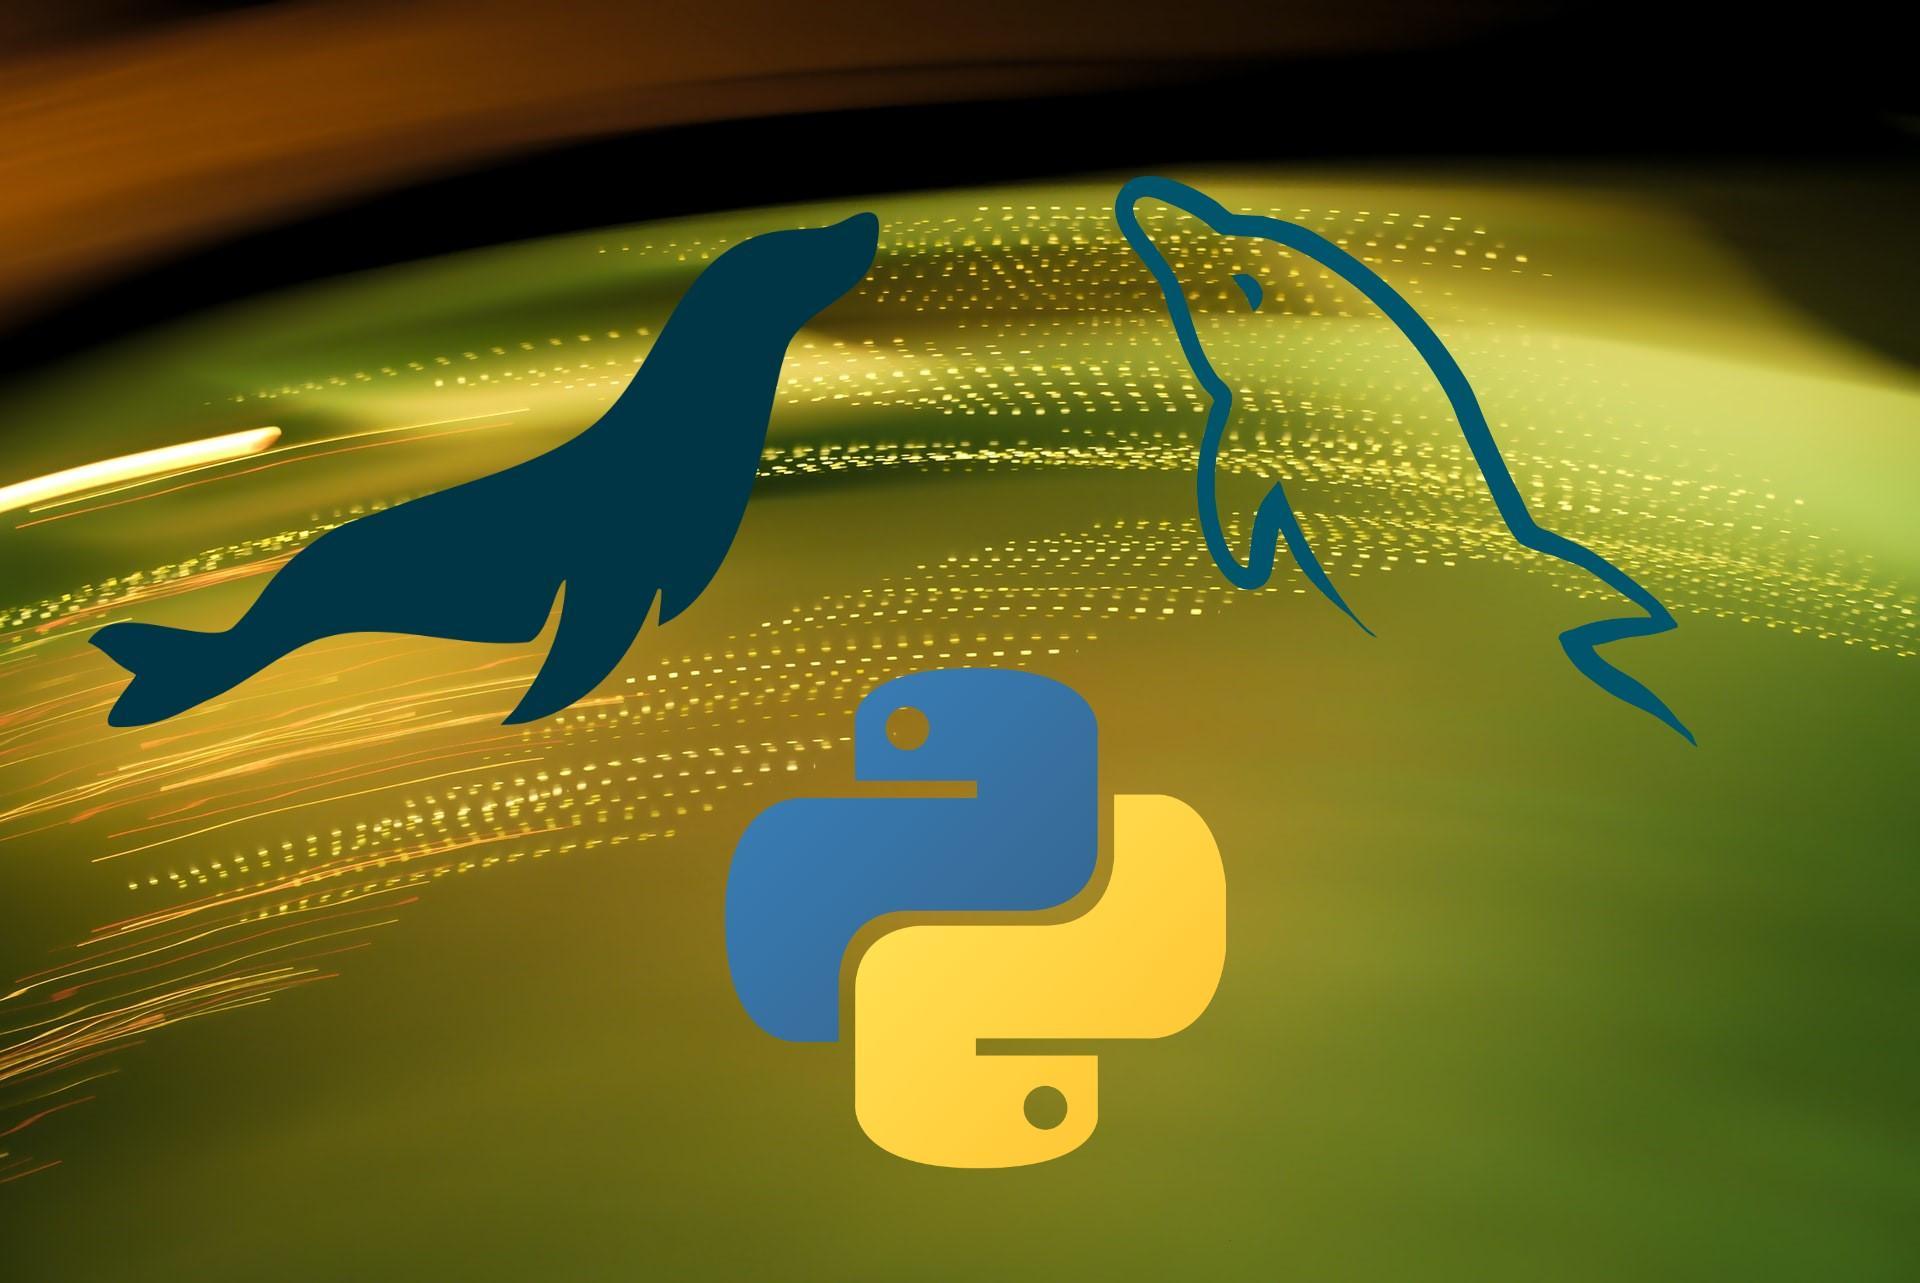 【PyMySQL】PythonでMySQL(MariaDB)に接続する